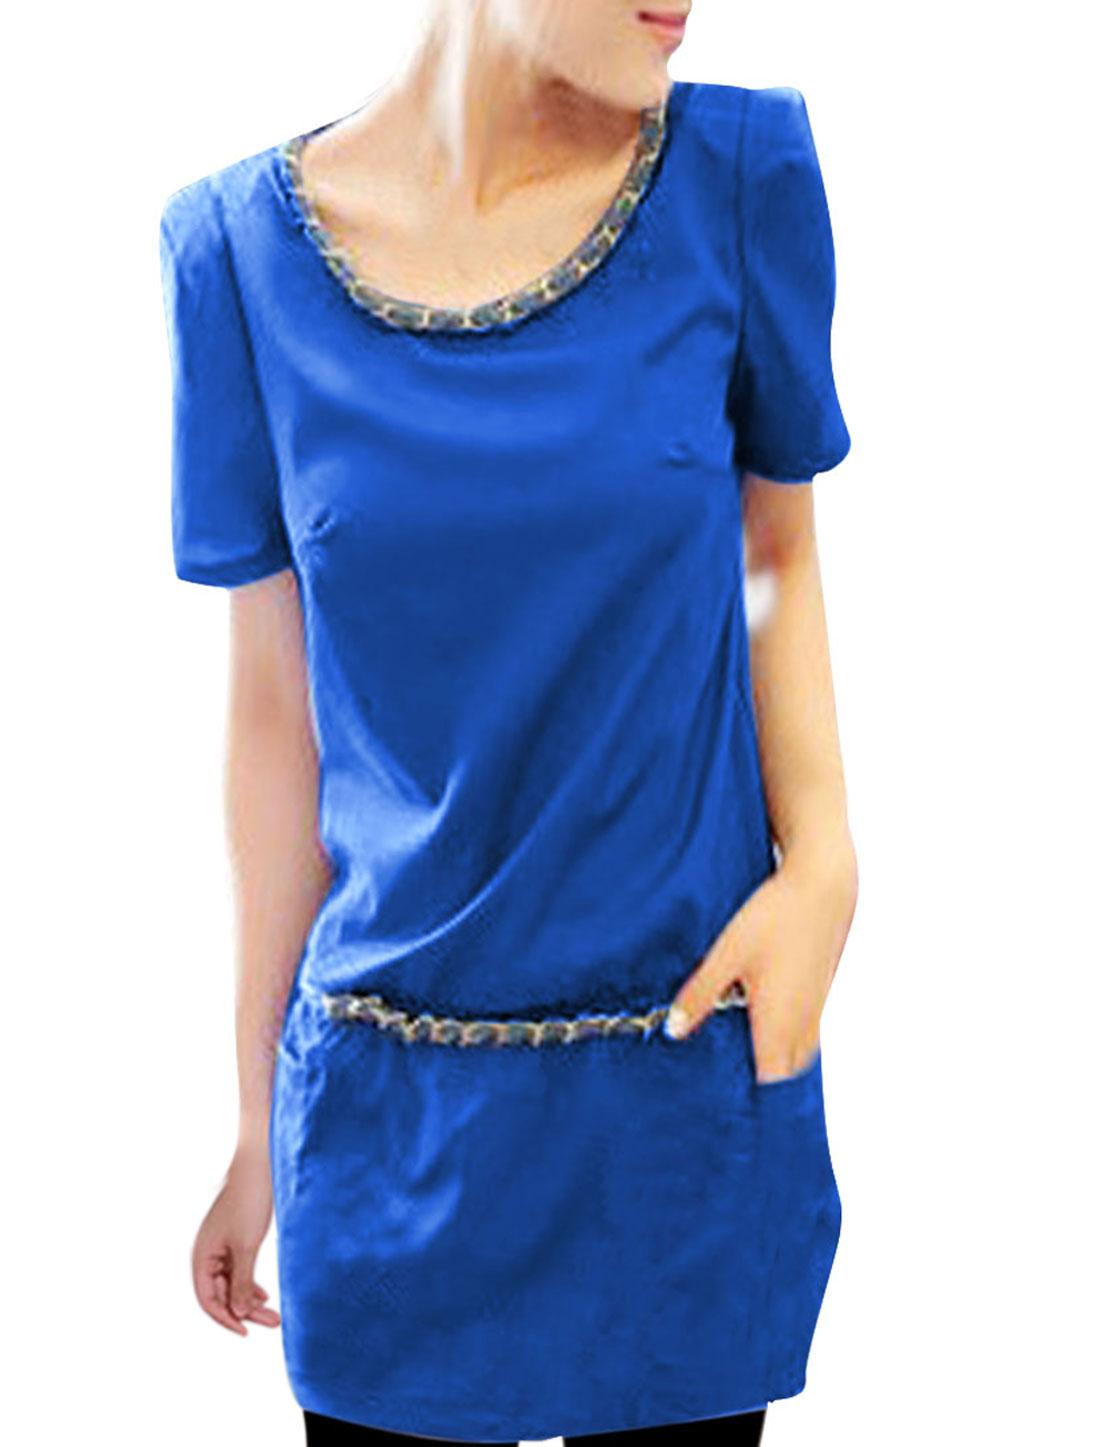 Women Chiffon Short Sleeve Chains Design Leisure Dress Sky Blue S